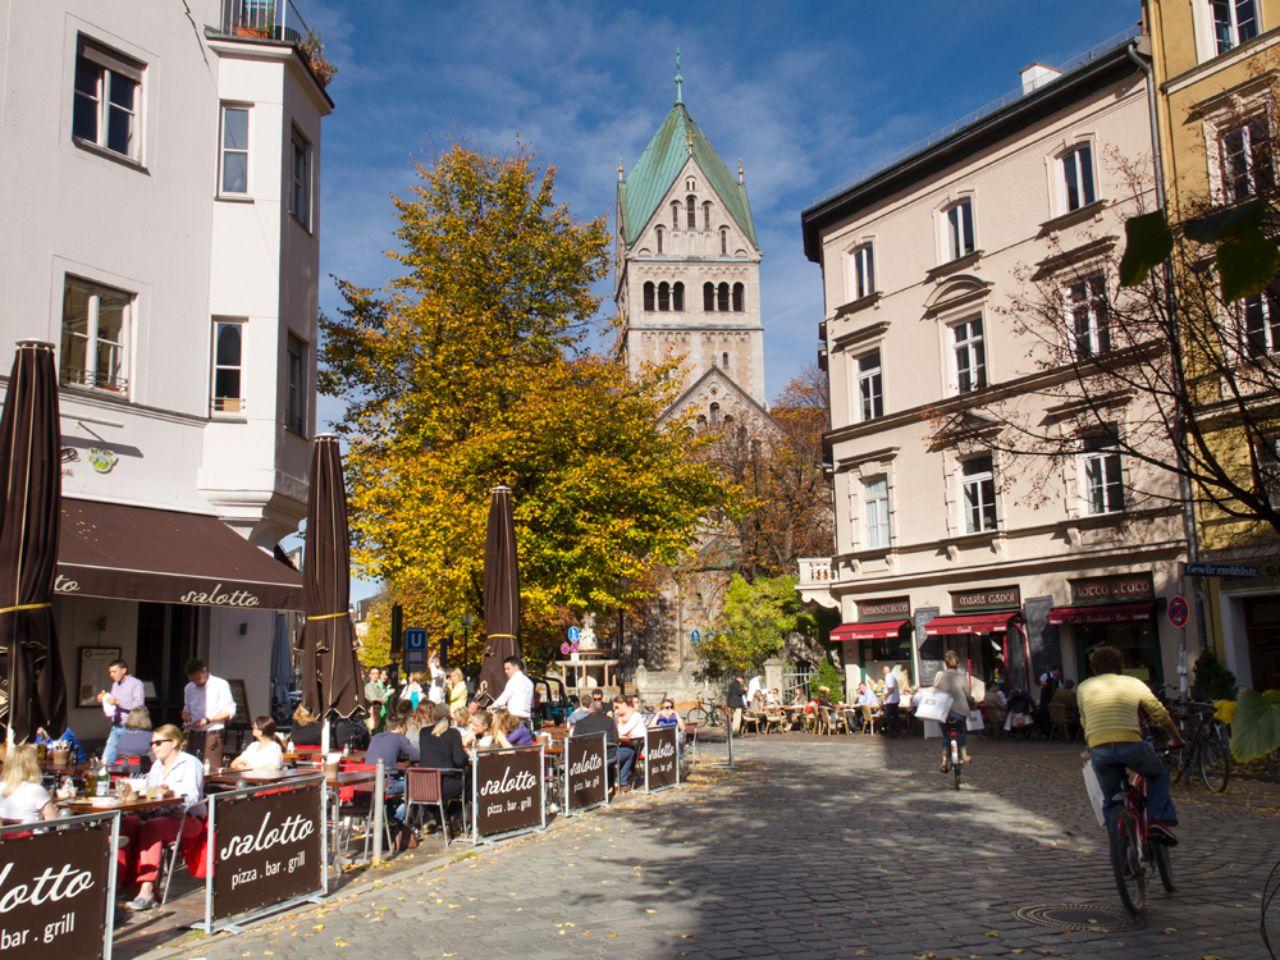 St Platz München lehel münchen stadtteil das offizielle stadtportal muenchen de